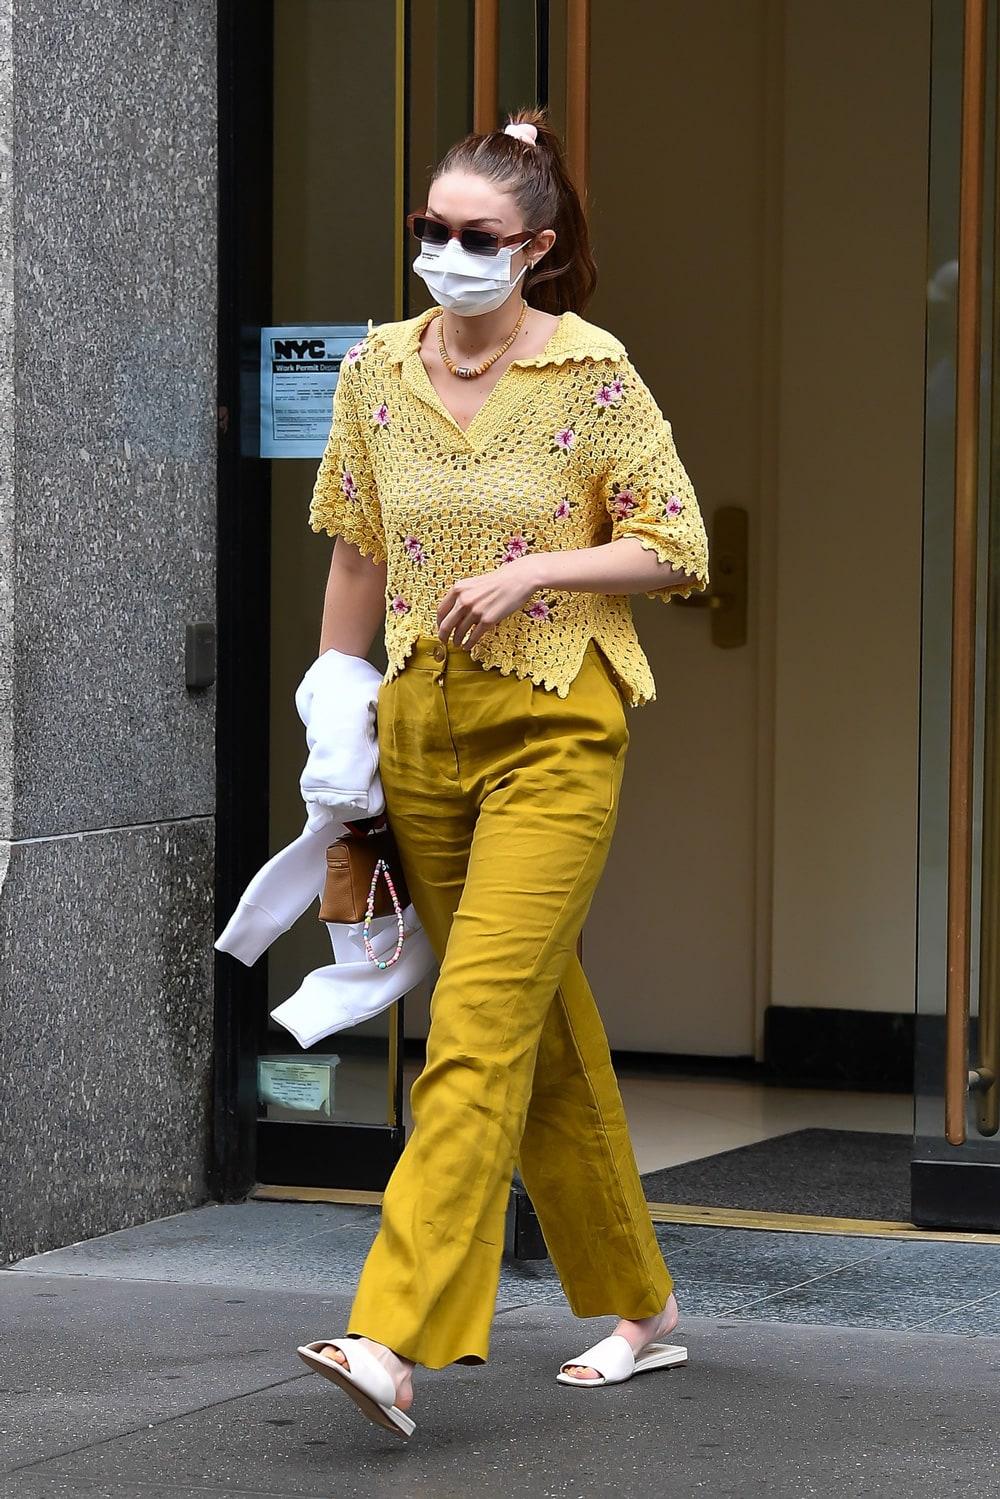 Street style inspiracija: Gigi Hadid nosi cool ležerni look za ljeto 2021.